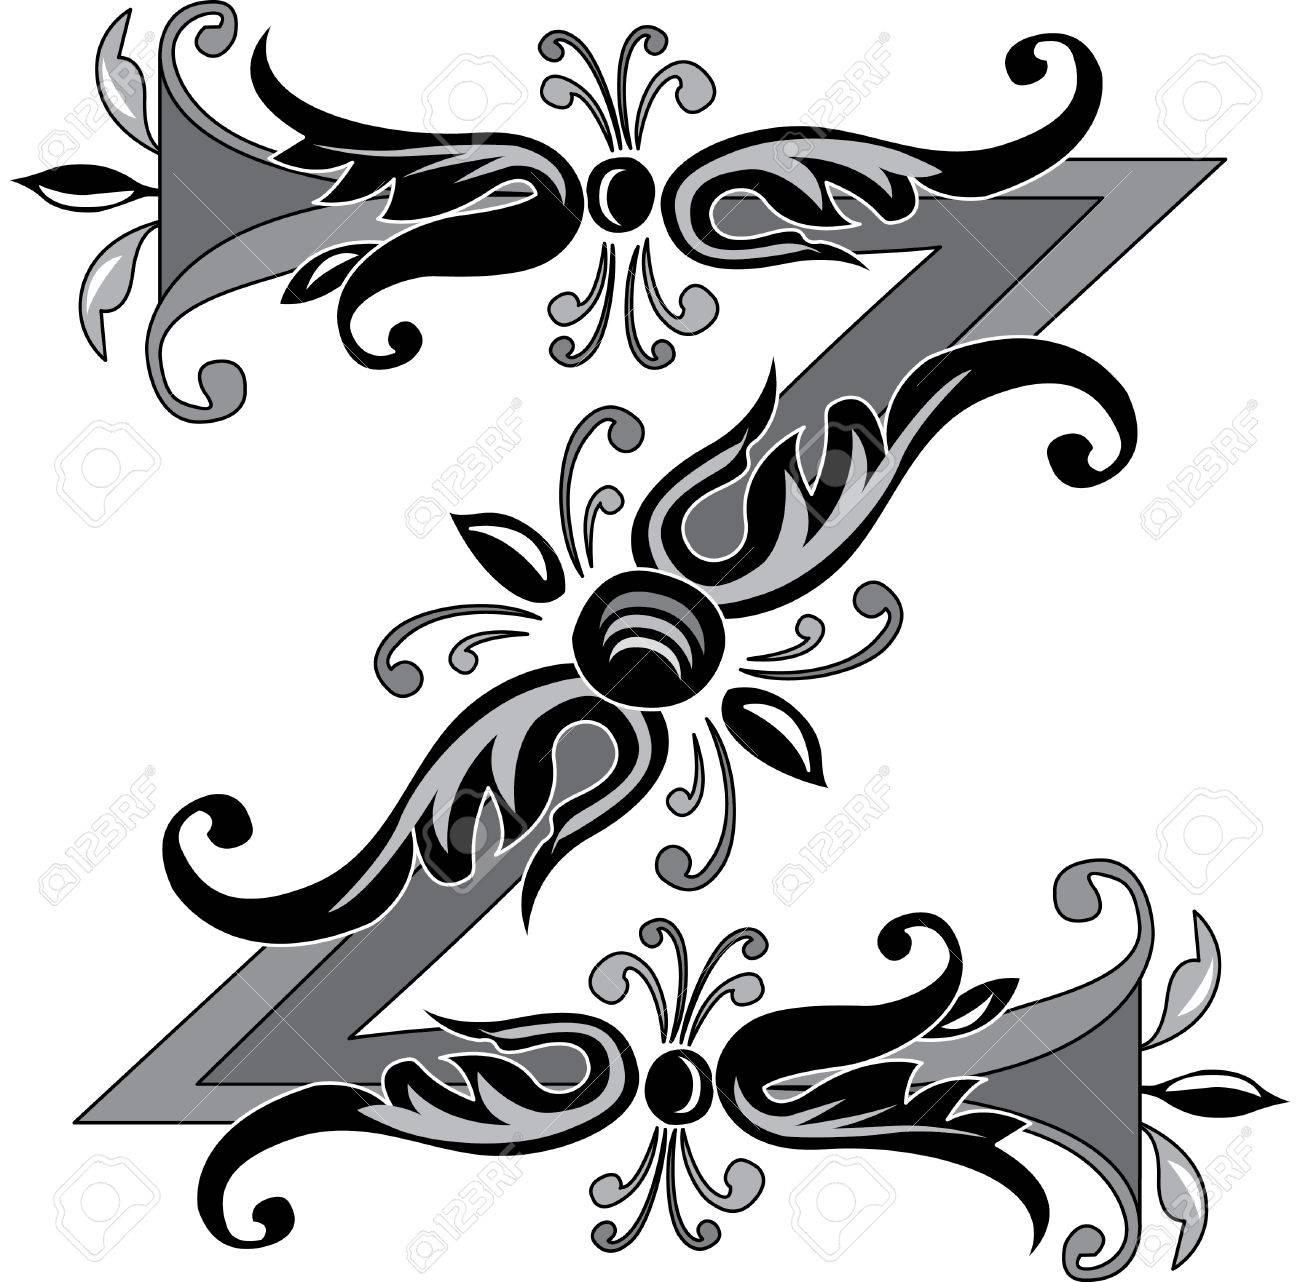 Foliage English Alphabet Letter Z Black And White Royalty Free